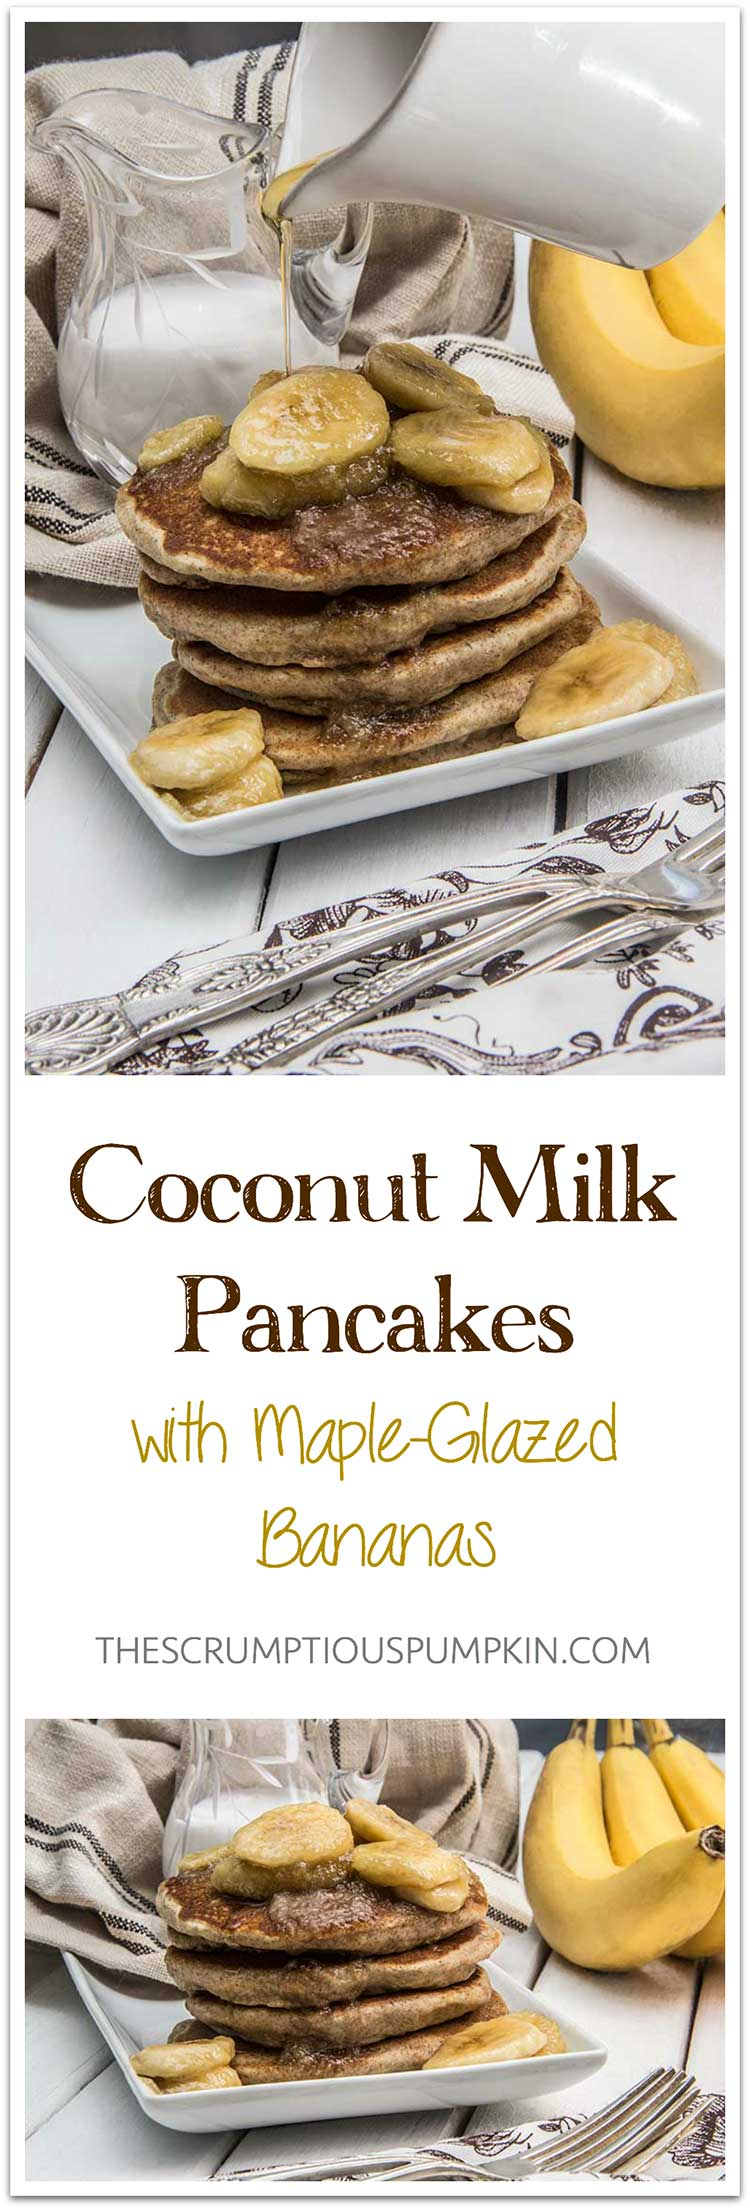 Coconut-Milk-Vegan-Pancakes-with-Maple-Glazed-Bananas